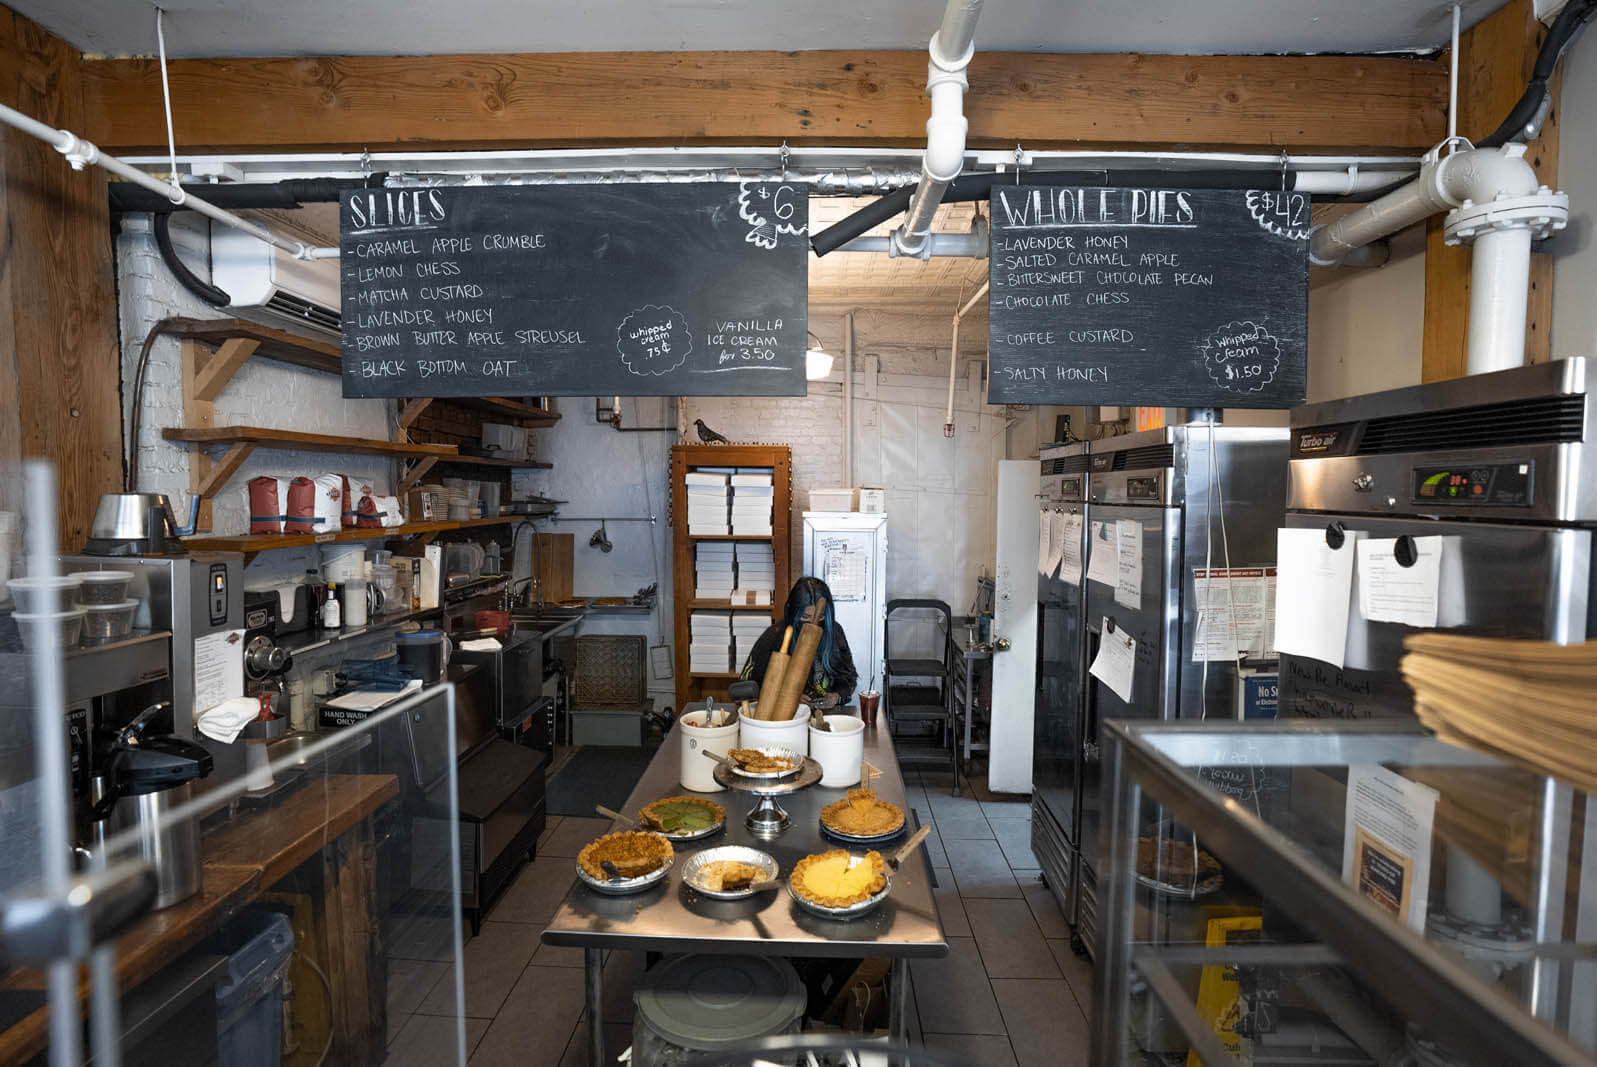 Four and Twenty Blackbird pie shop and bakery in Gowanus Brooklyn